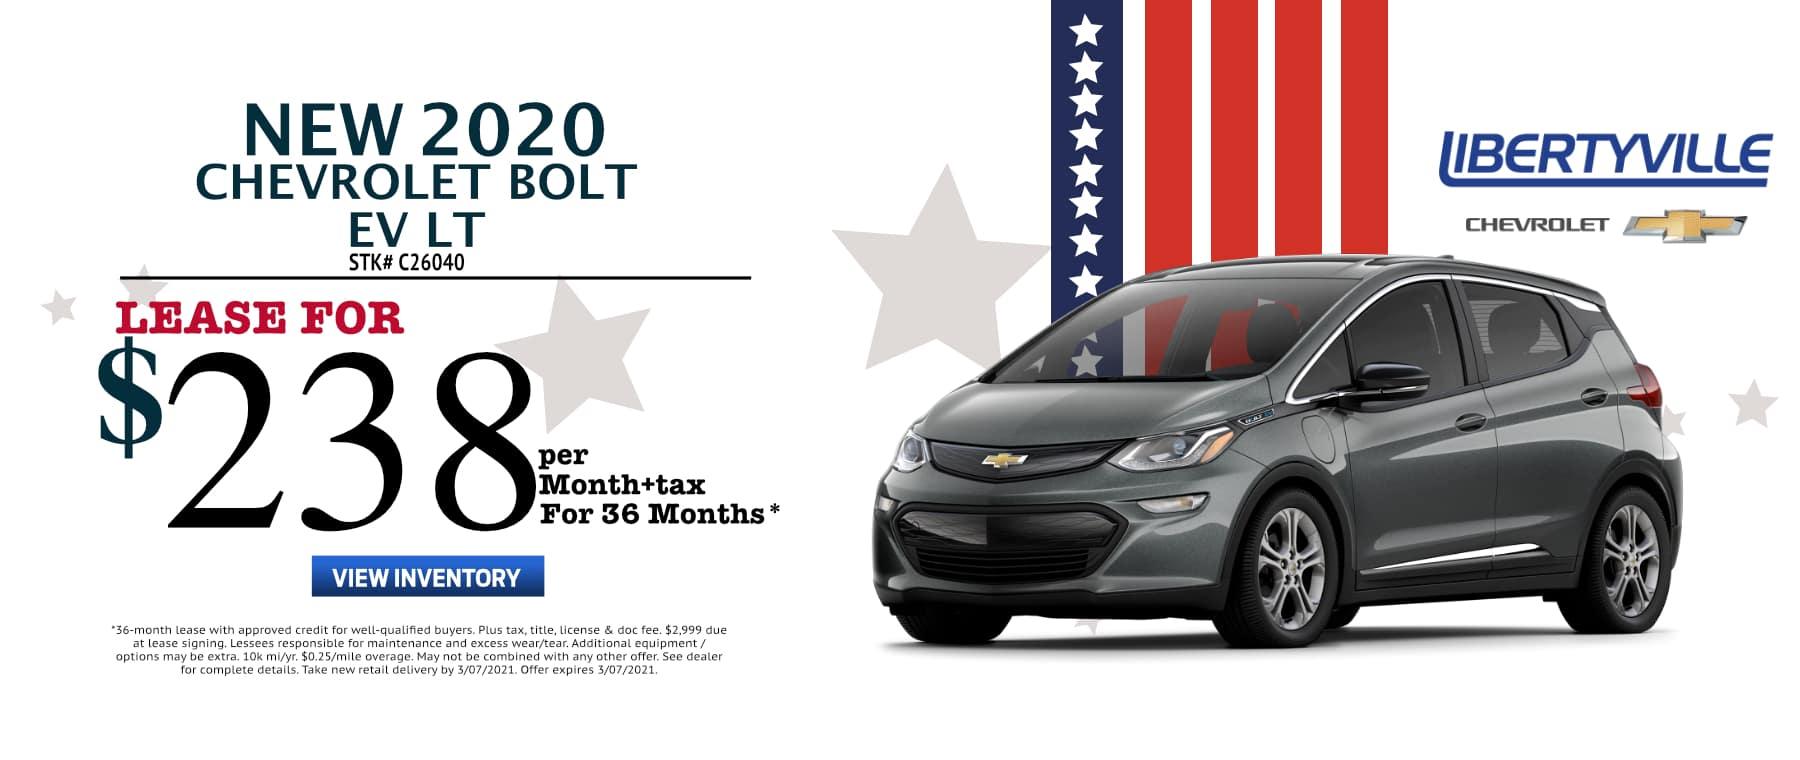 February_2021_Bolt_LEASE_Libertyville_Chevrolet